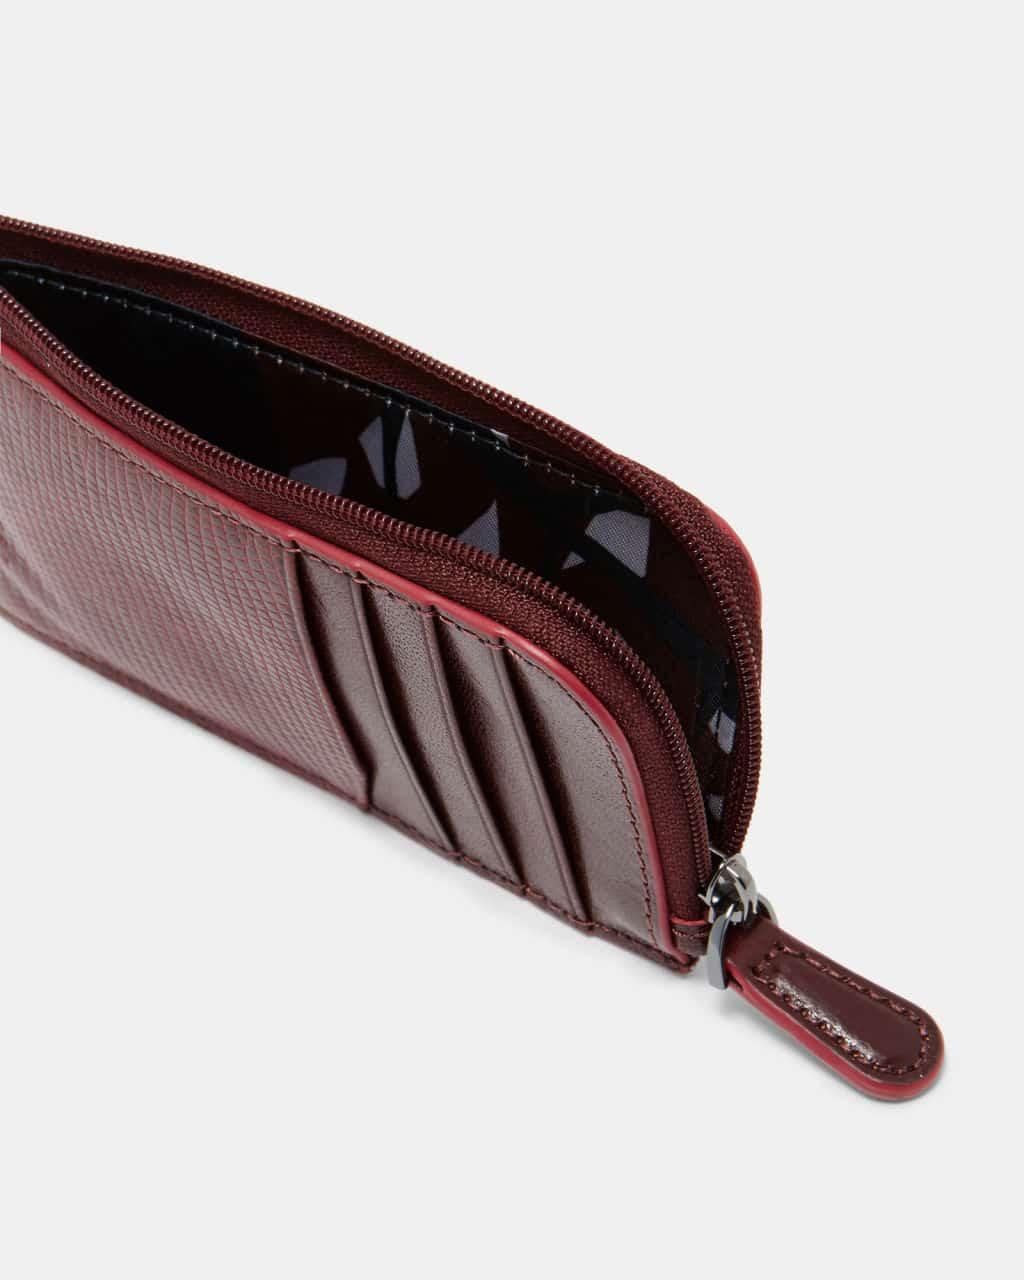 0c68d5dd0c76cf ted baker london goblin dark red contrast edge leather card holder